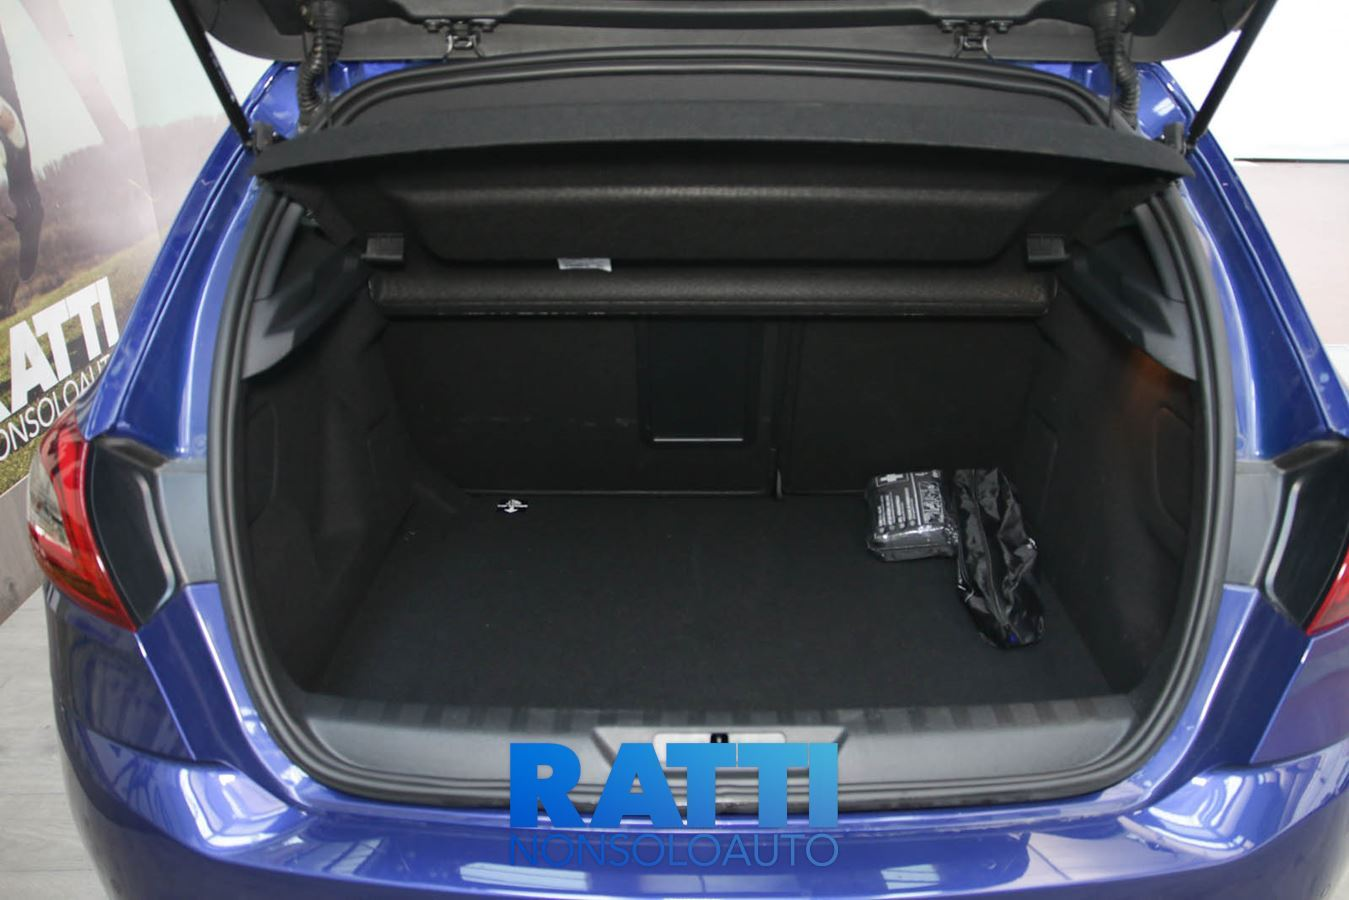 308 Berlina Gt PureTech Turbo 1.6 225CV EAT8